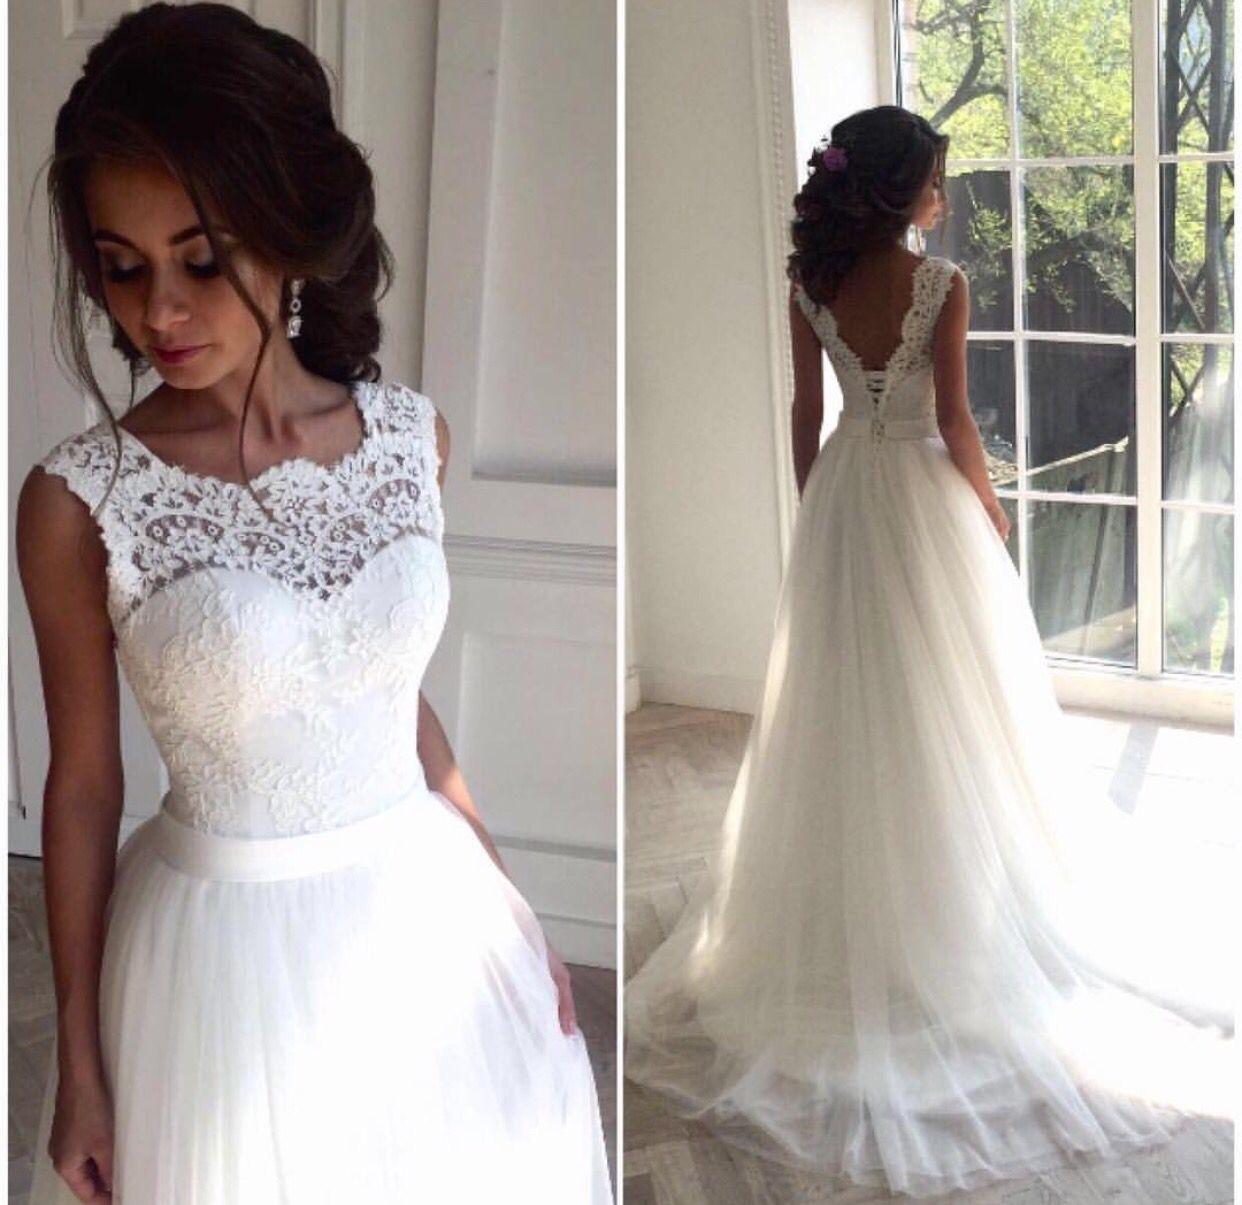 Different color wedding dresses  Future wedding dress  Dream wedding  Pinterest  Wedding dresses